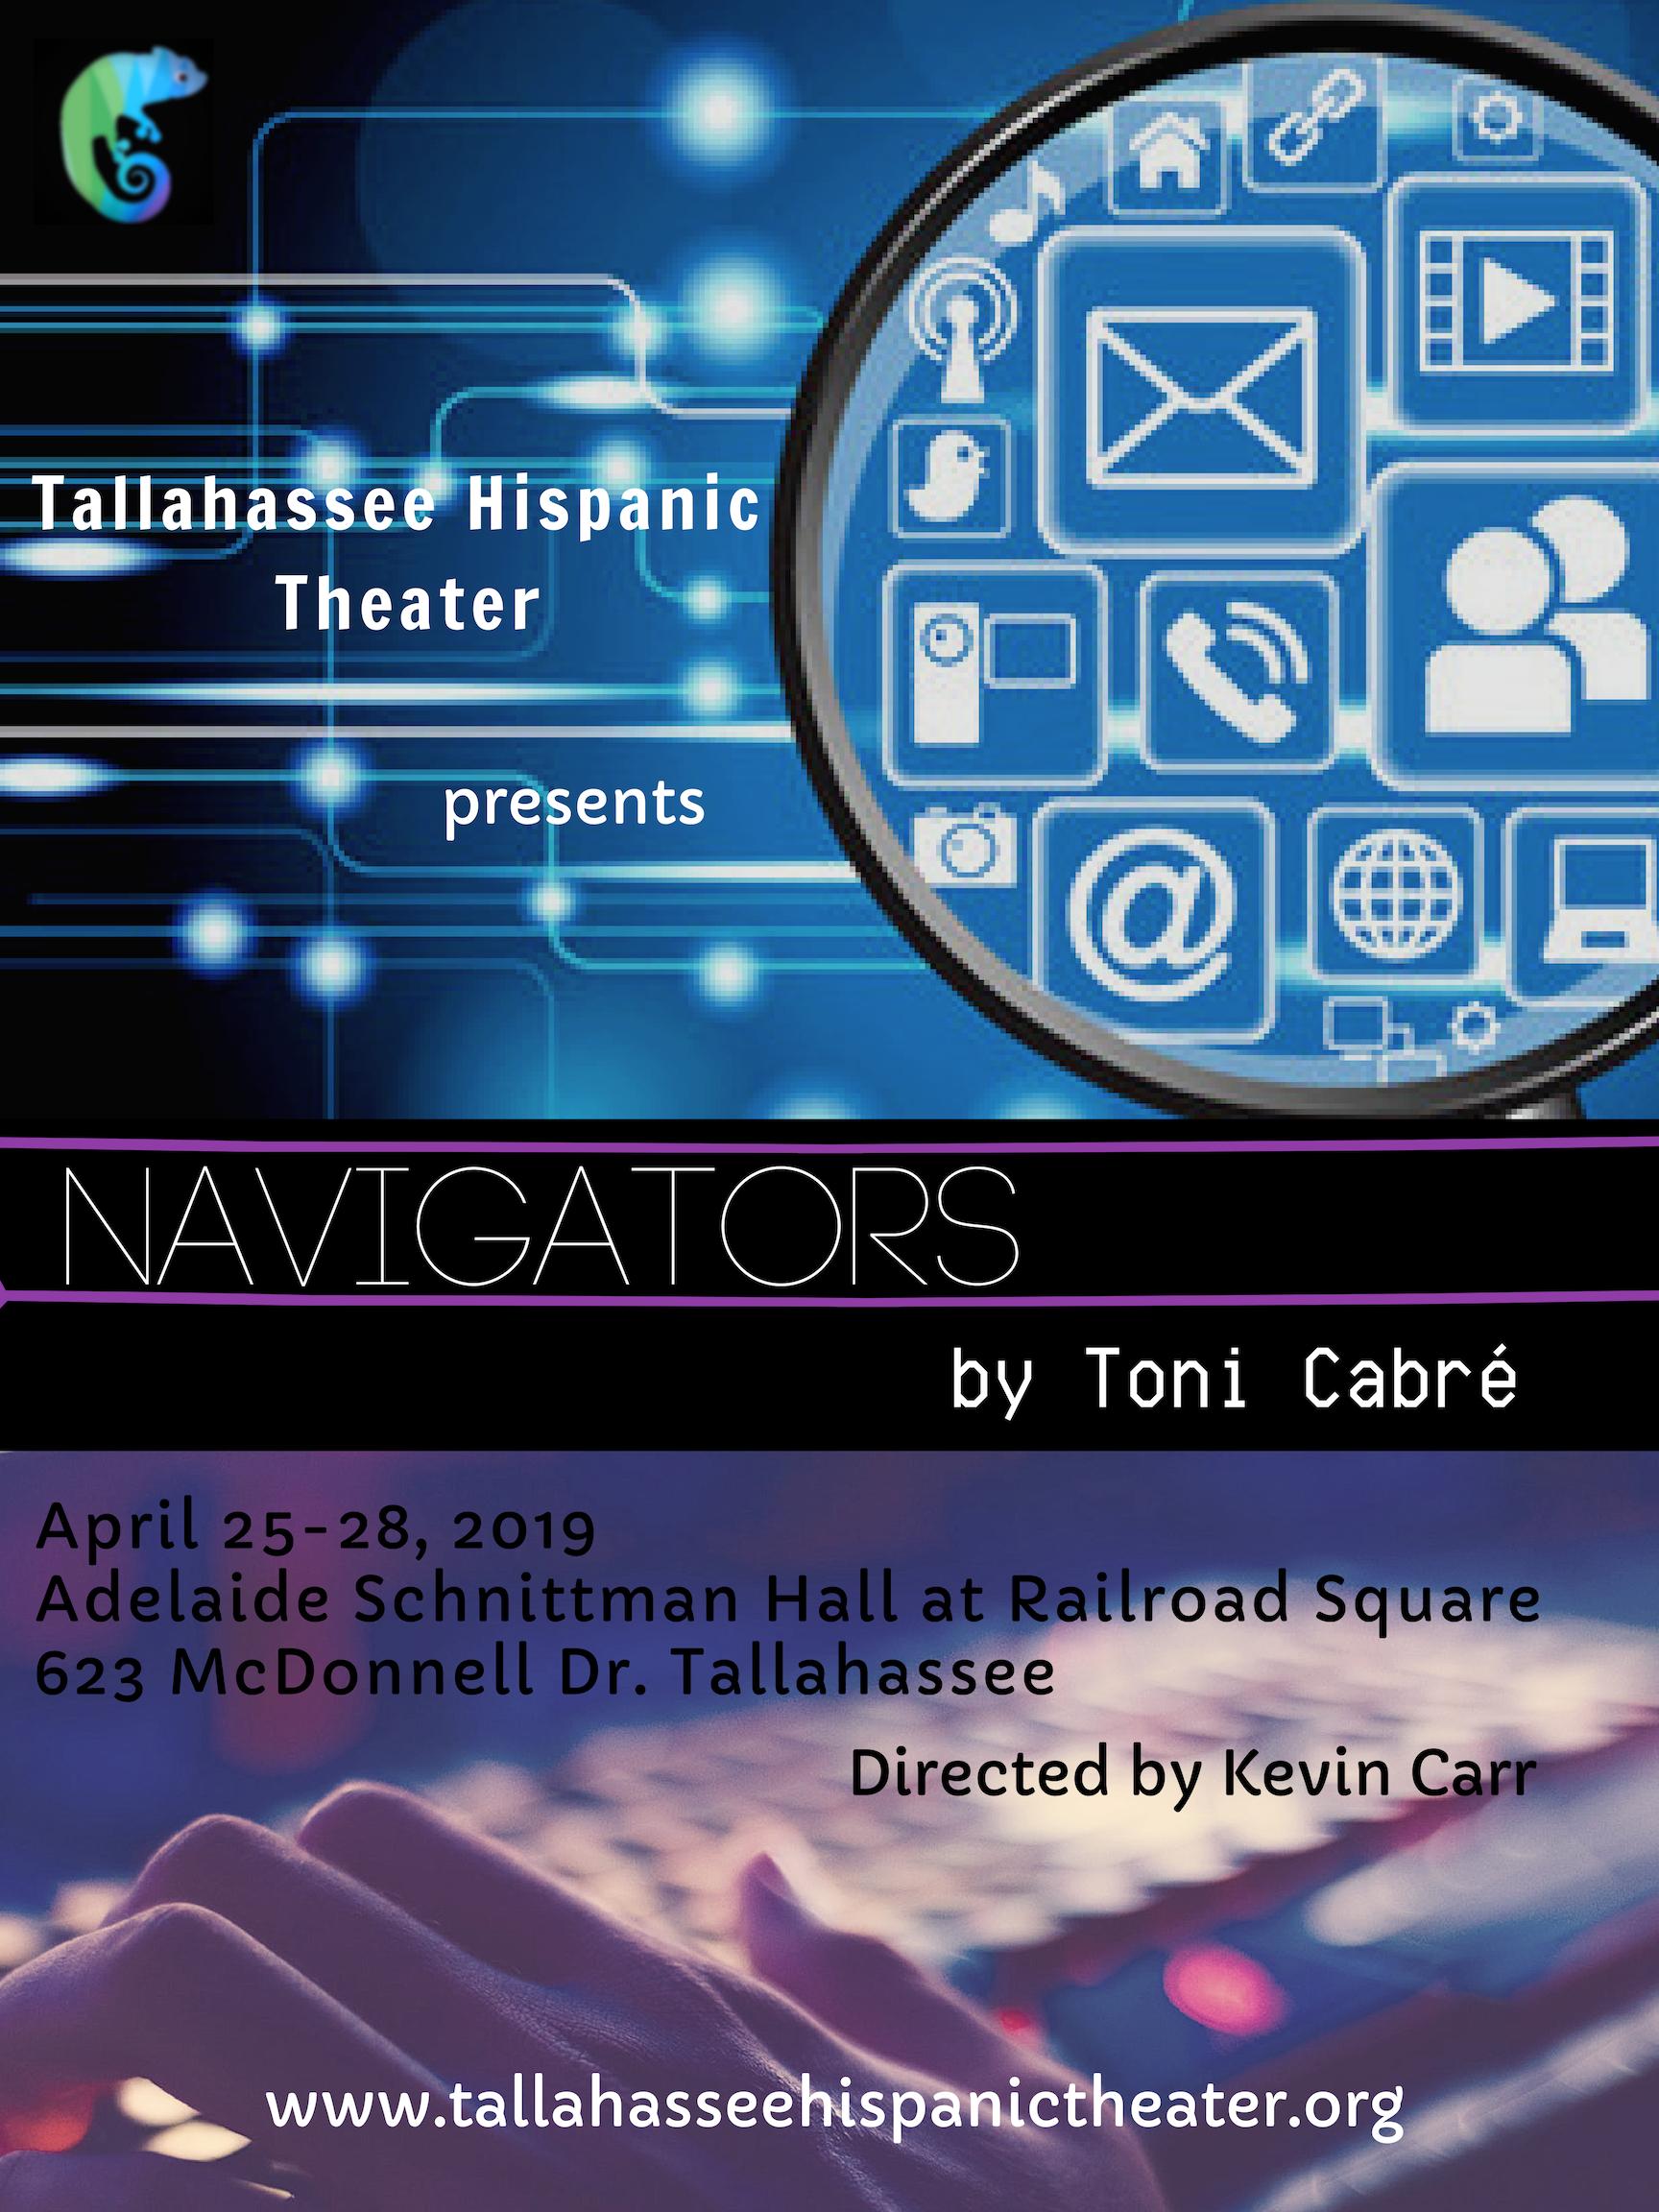 Tallahassee Hispanic Theater's new production